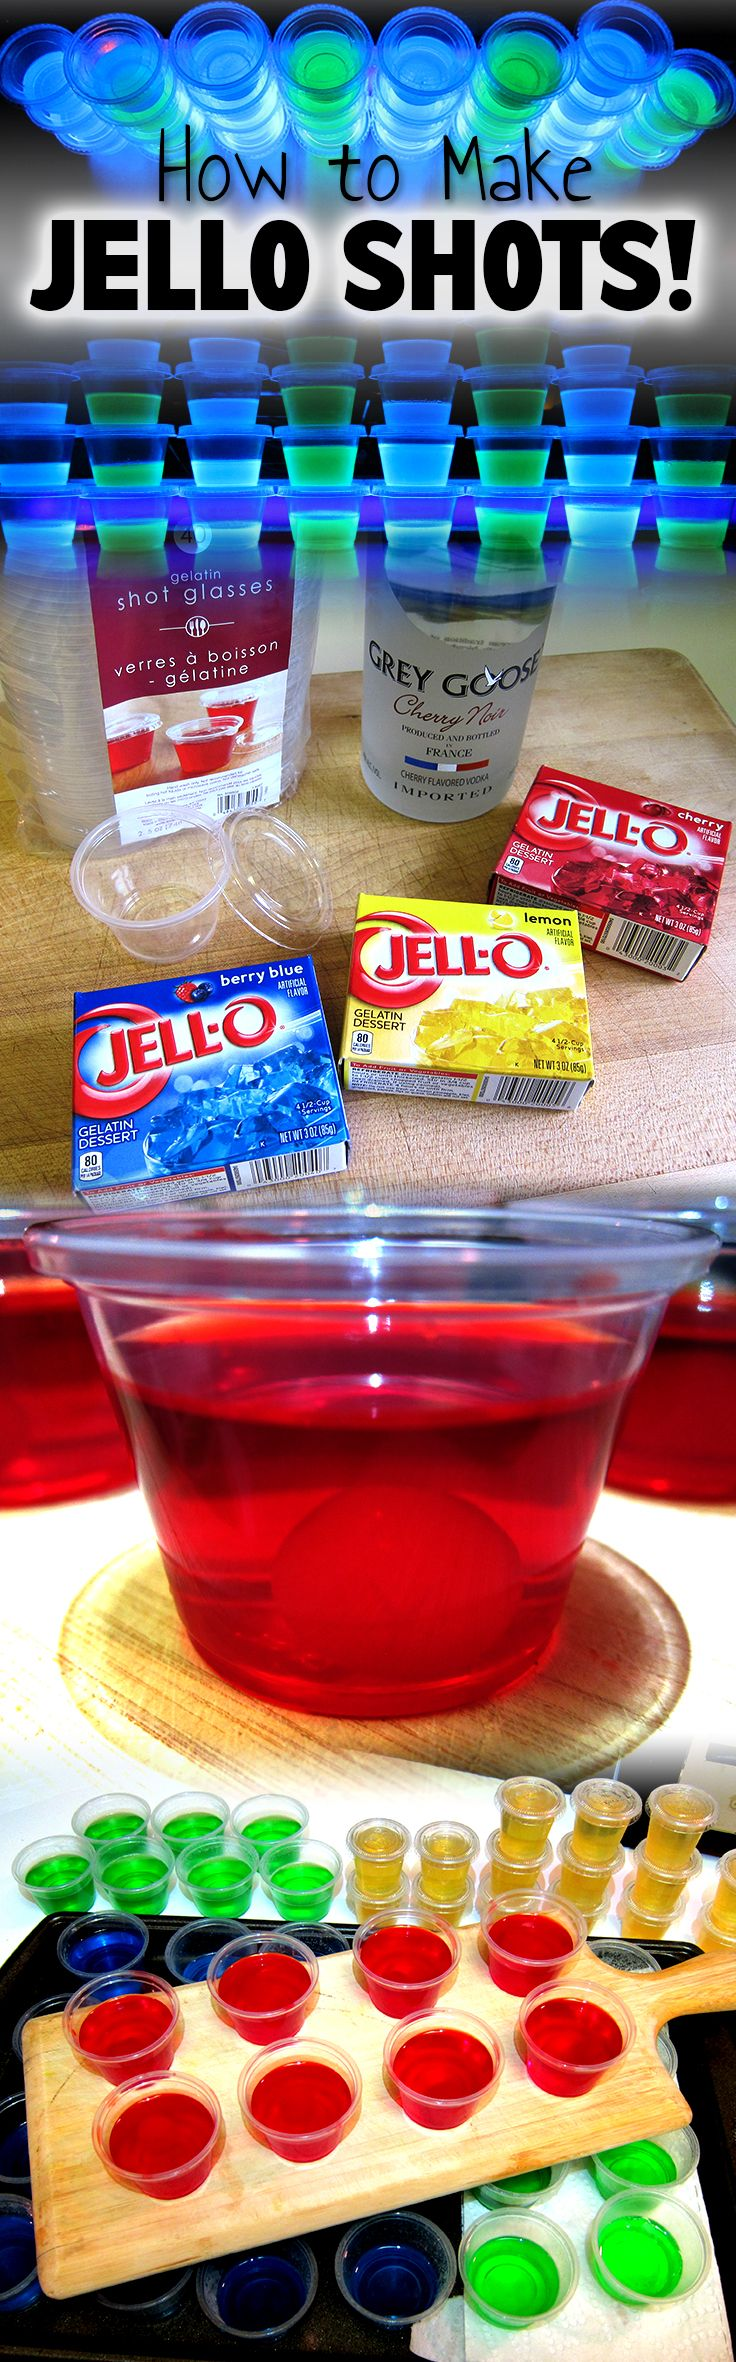 HOW TO MAKE JELLO SHOTS - The basic Jello Shot recipe, and also ...